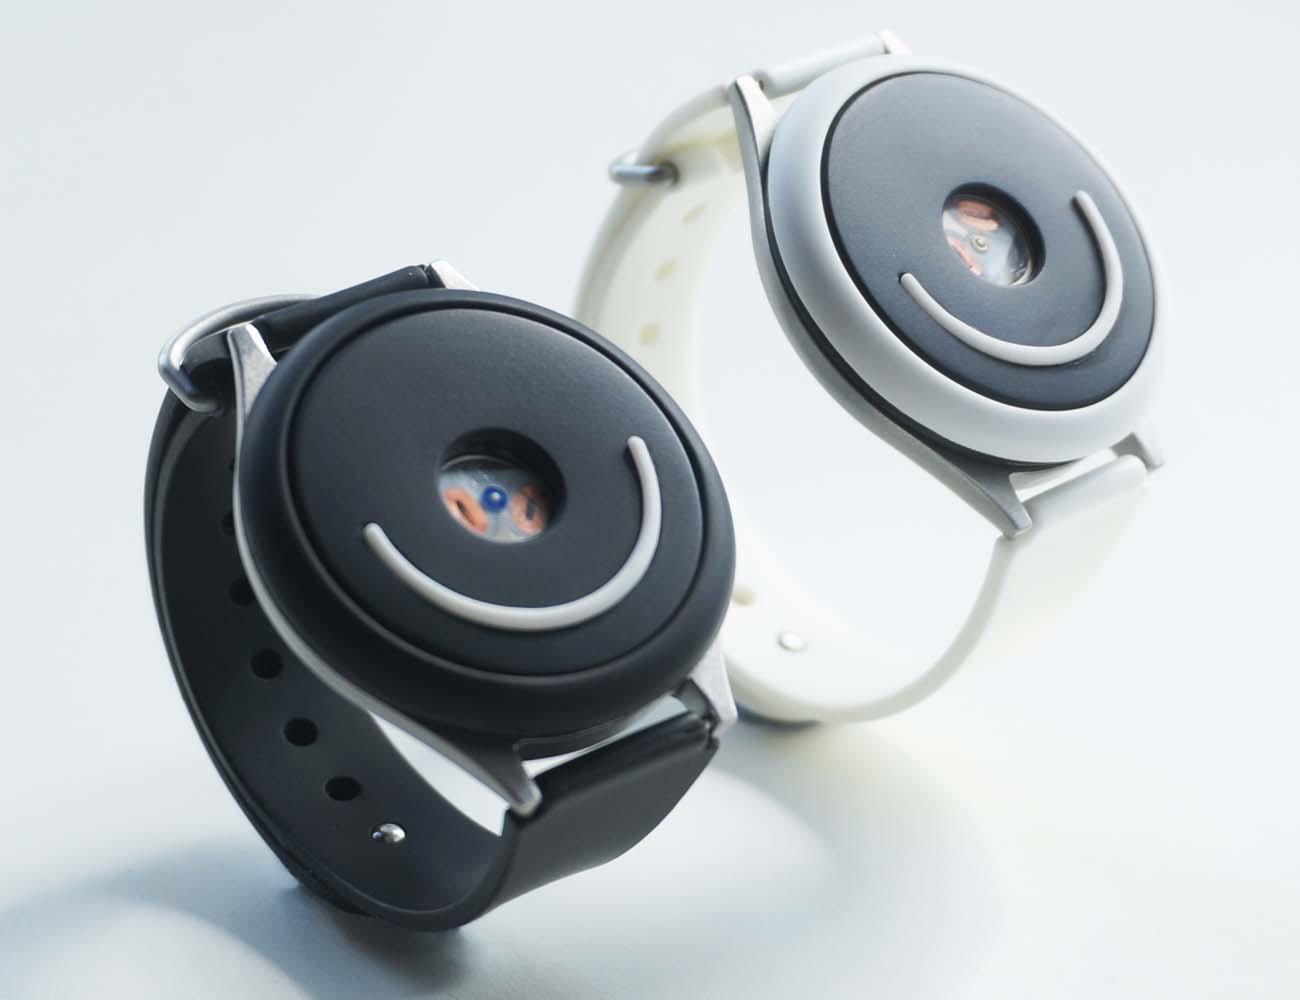 doppel – Performance-Enhancing Wearable Technology